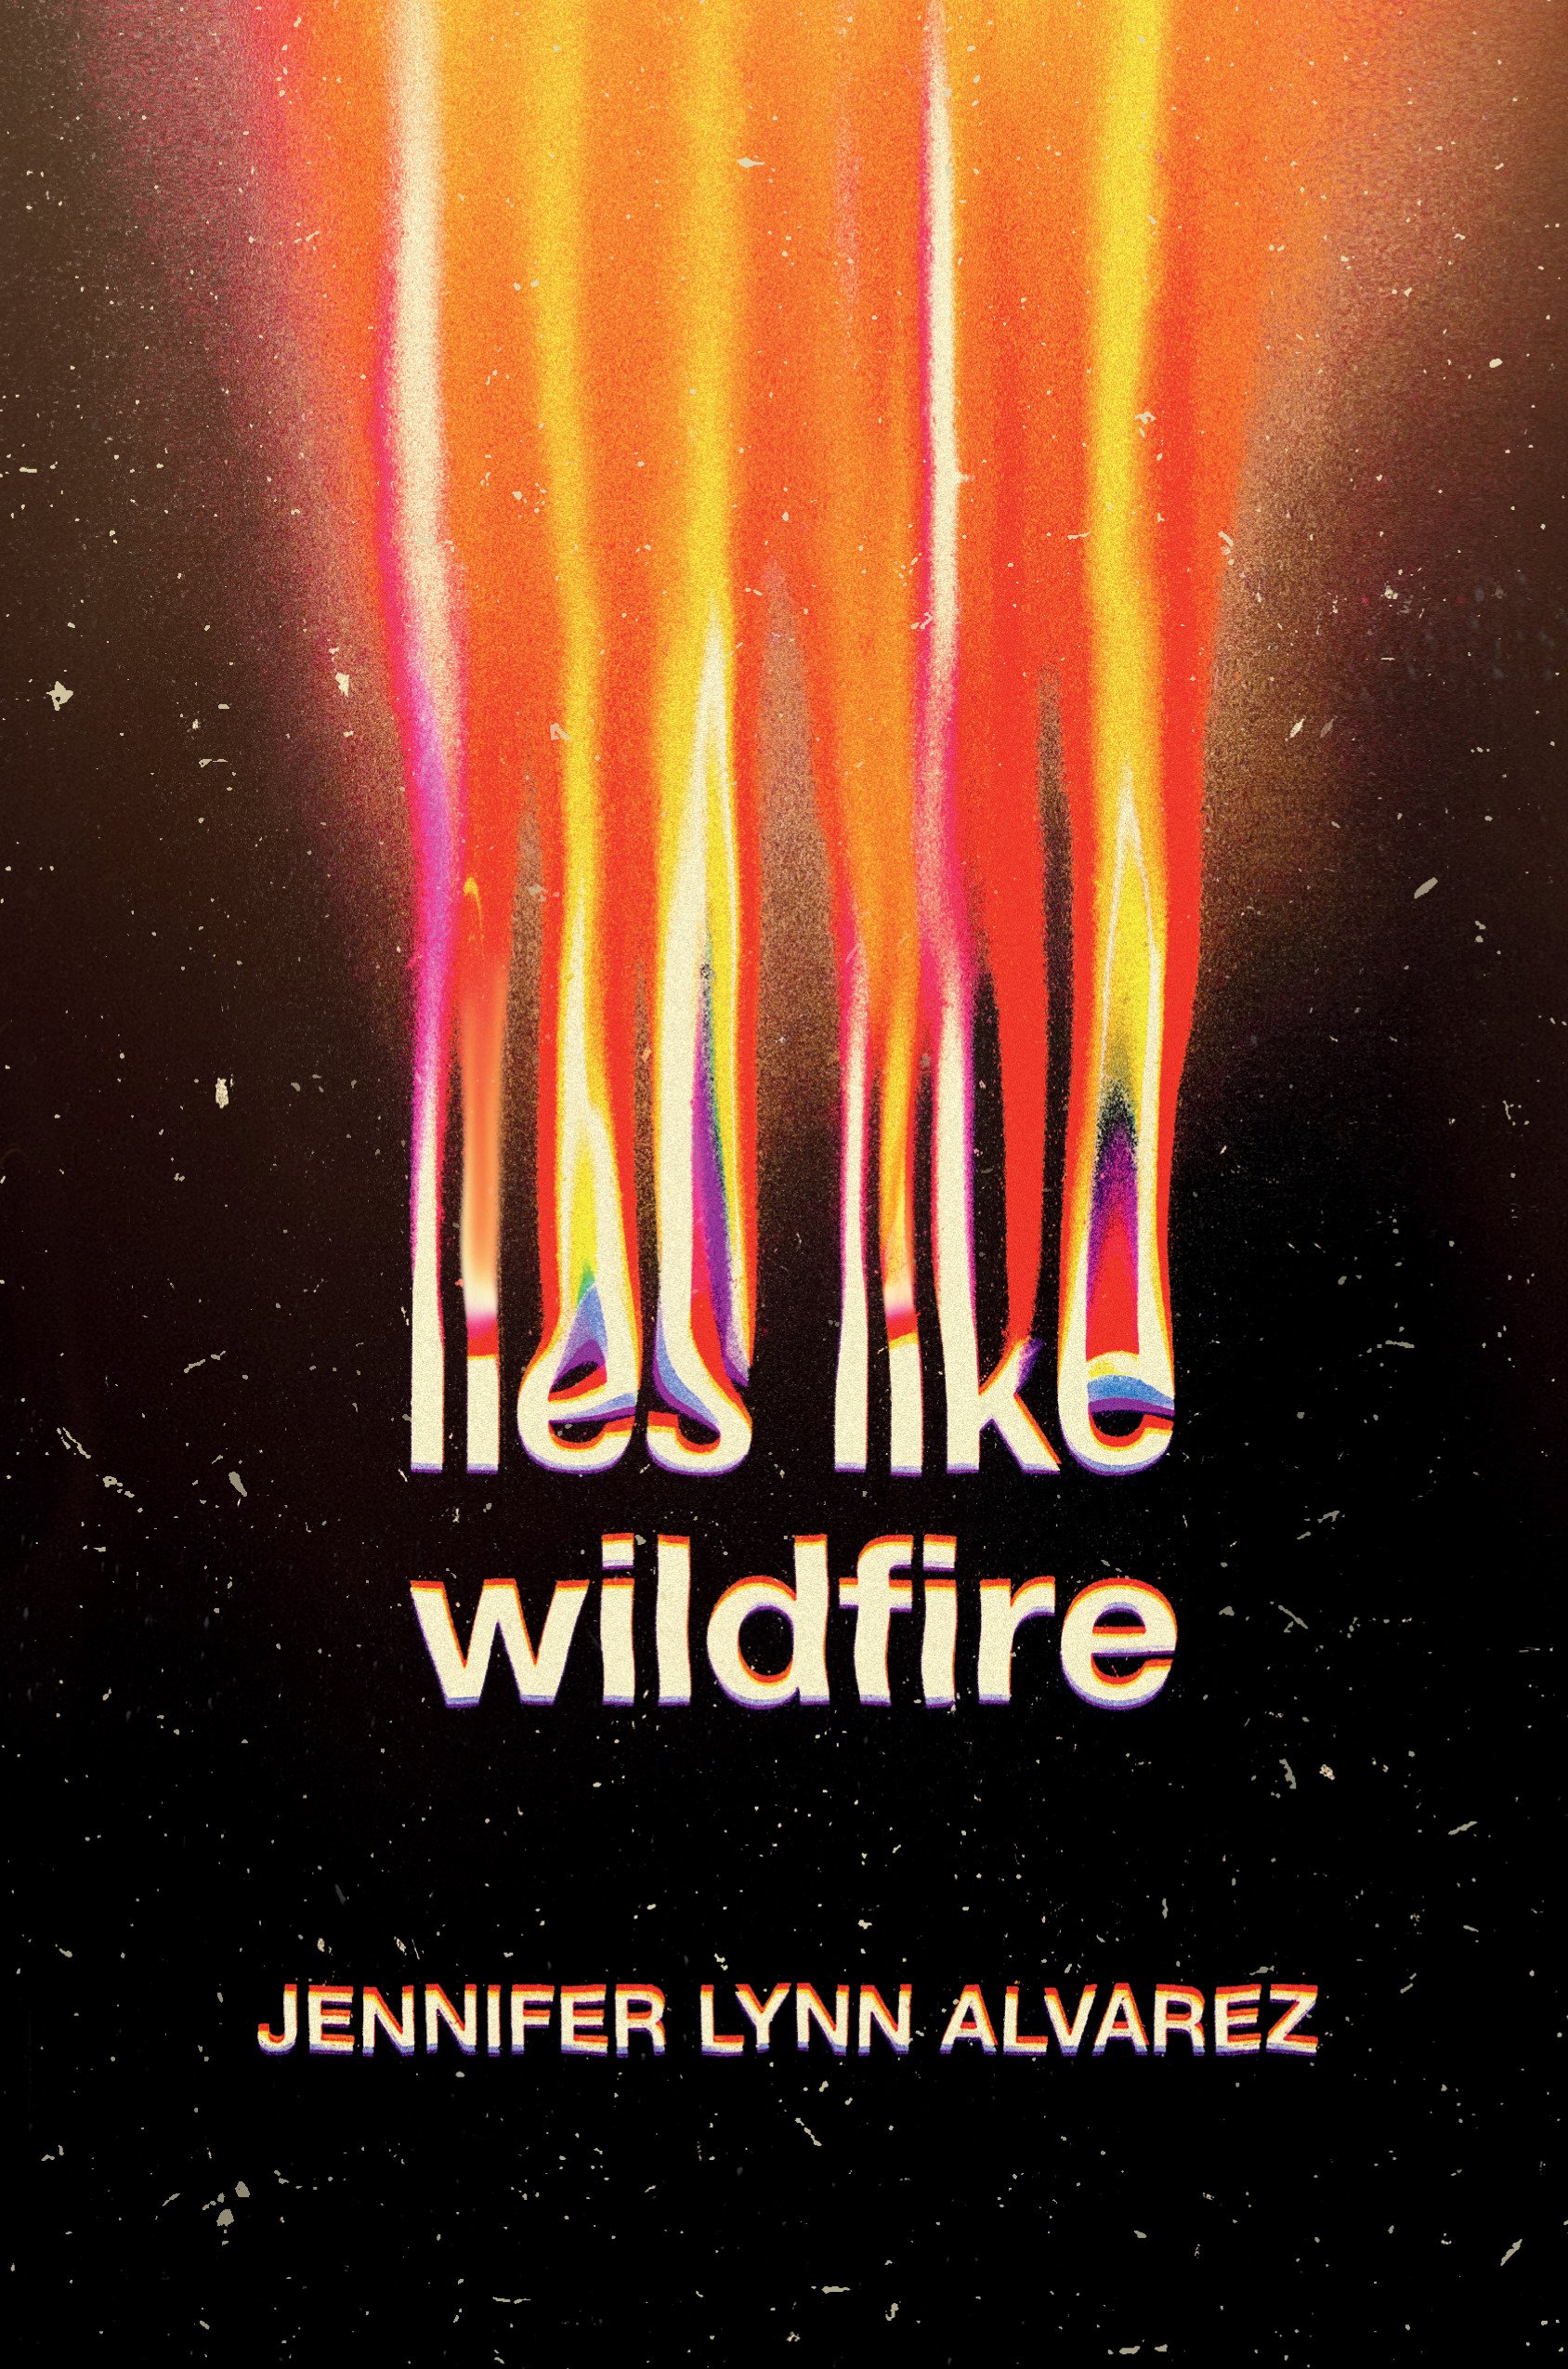 """Lies like wildfire"" by Jennifer Lynn Alvarez"